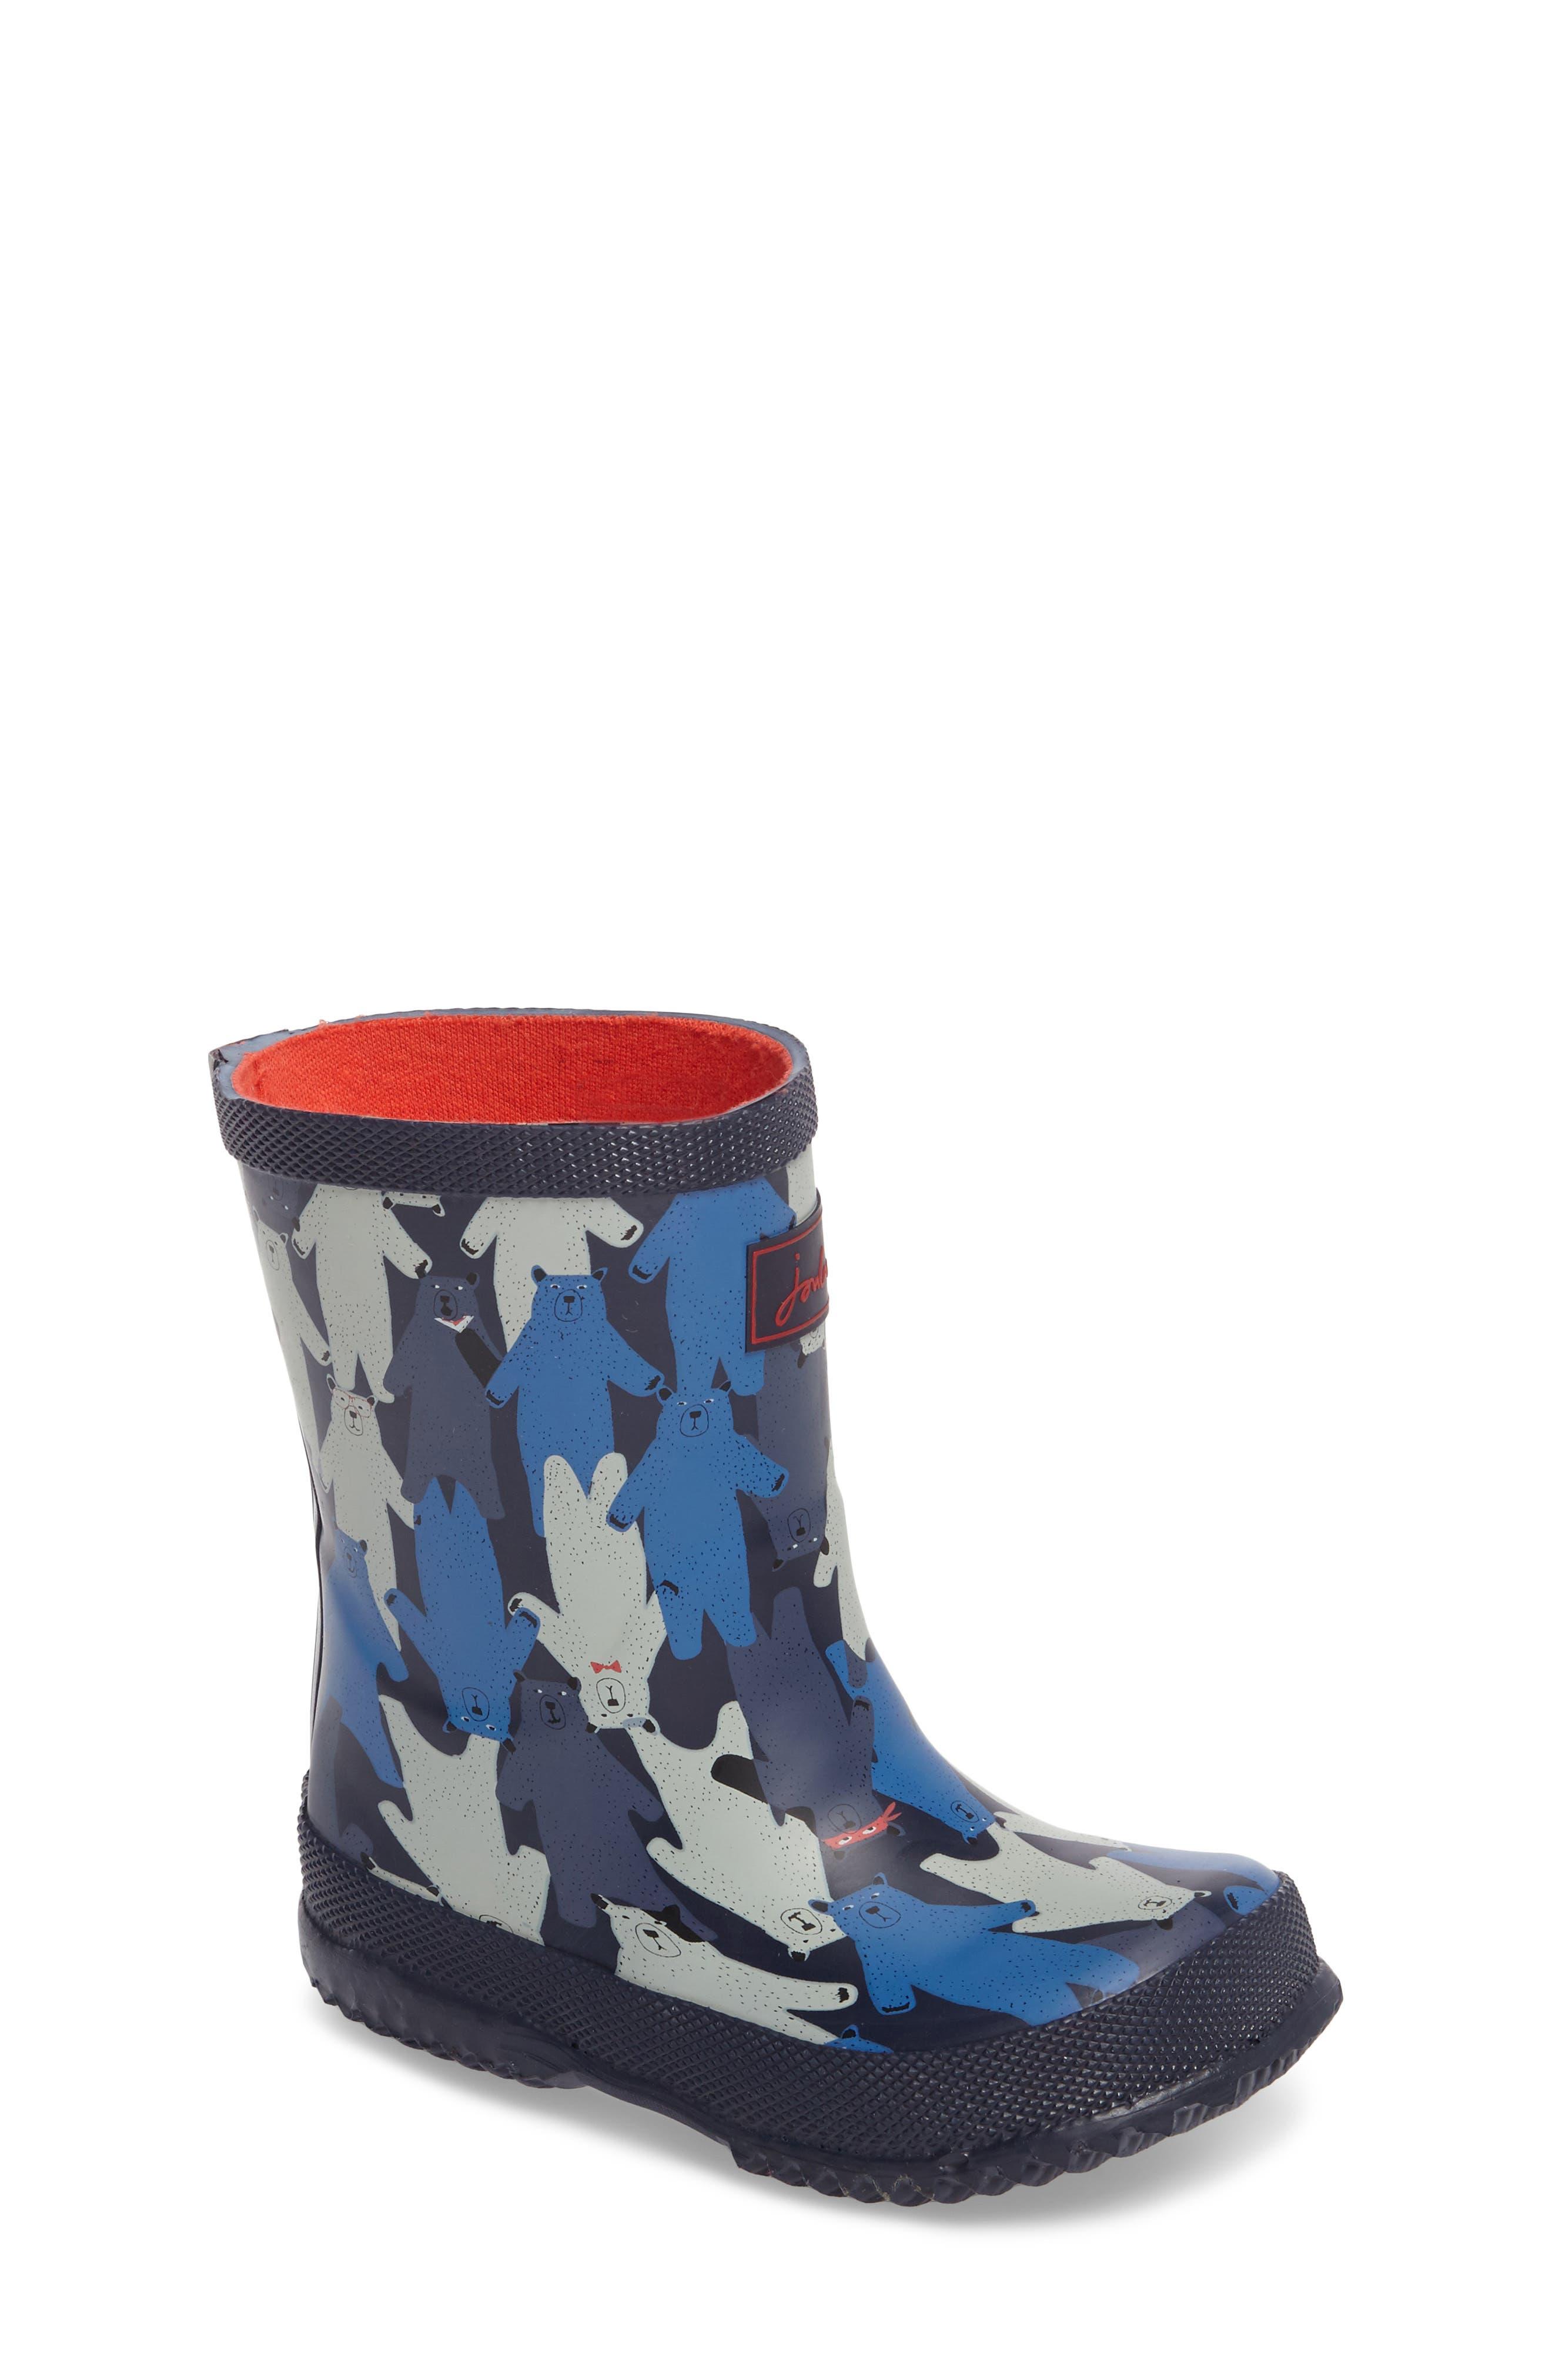 Printed Waterproof Rain Boot,                             Main thumbnail 1, color,                             Multi Bear Camo